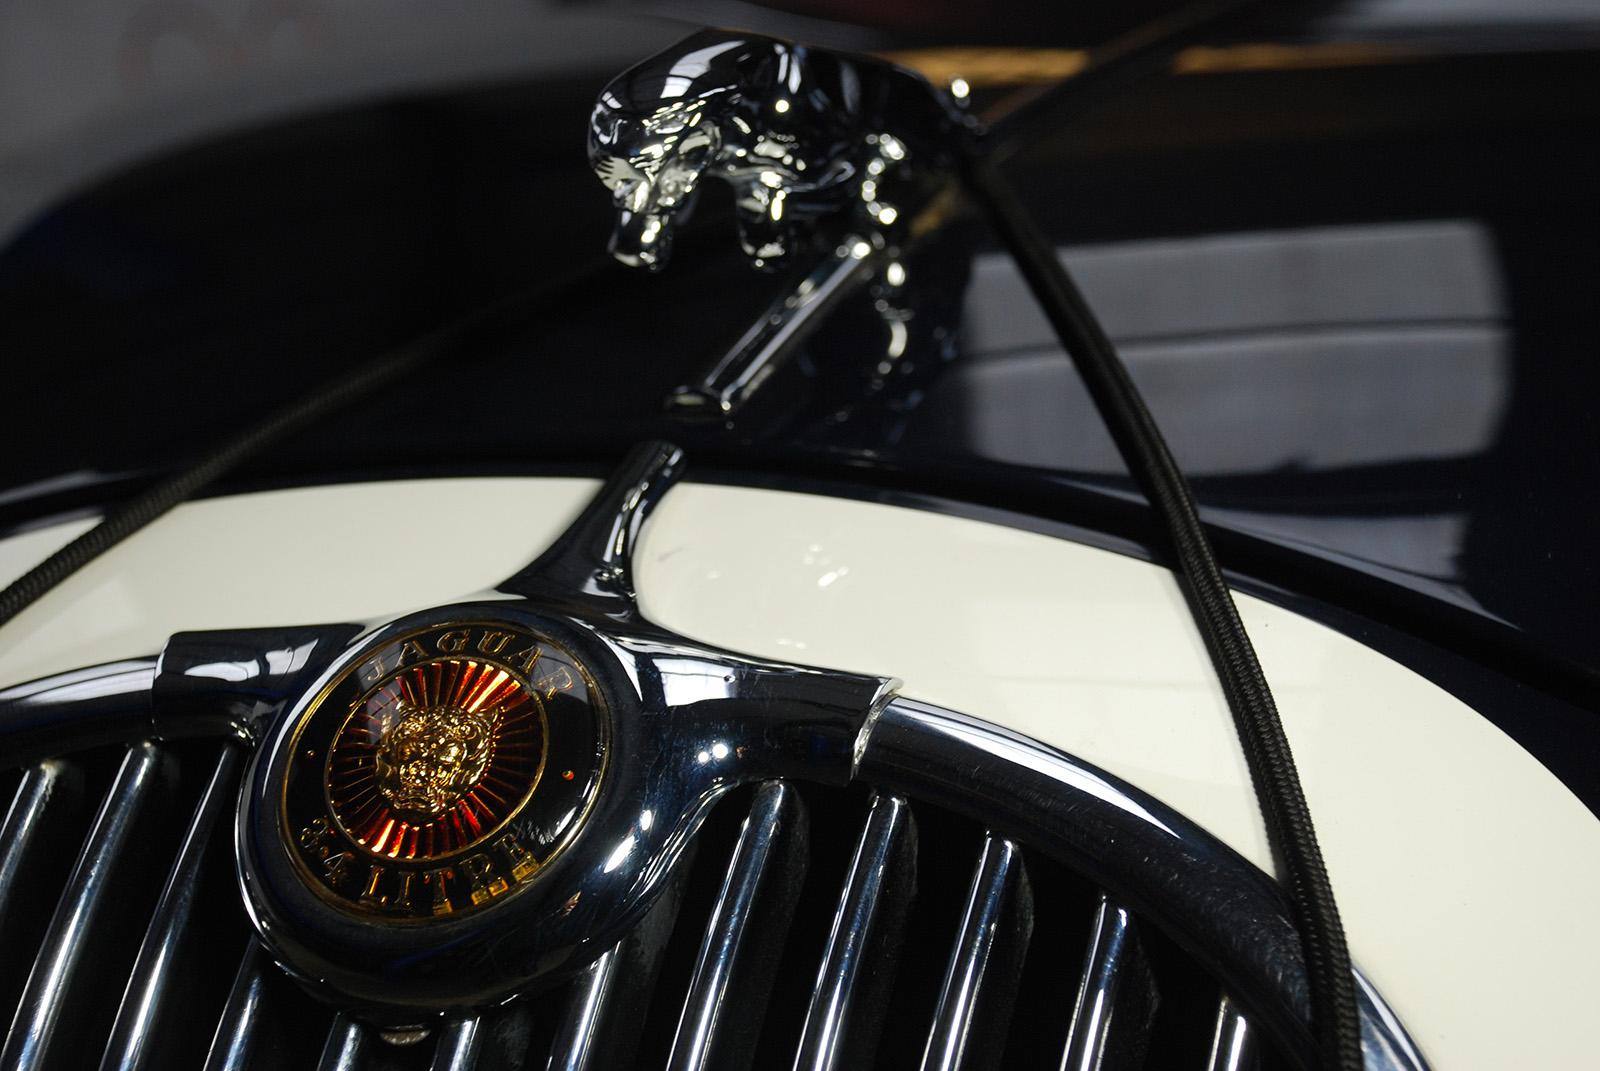 1959 bscc_Jaguar_competition_mk I_sayer selection_scragg_wilkinson_iva400_web_5.jpg